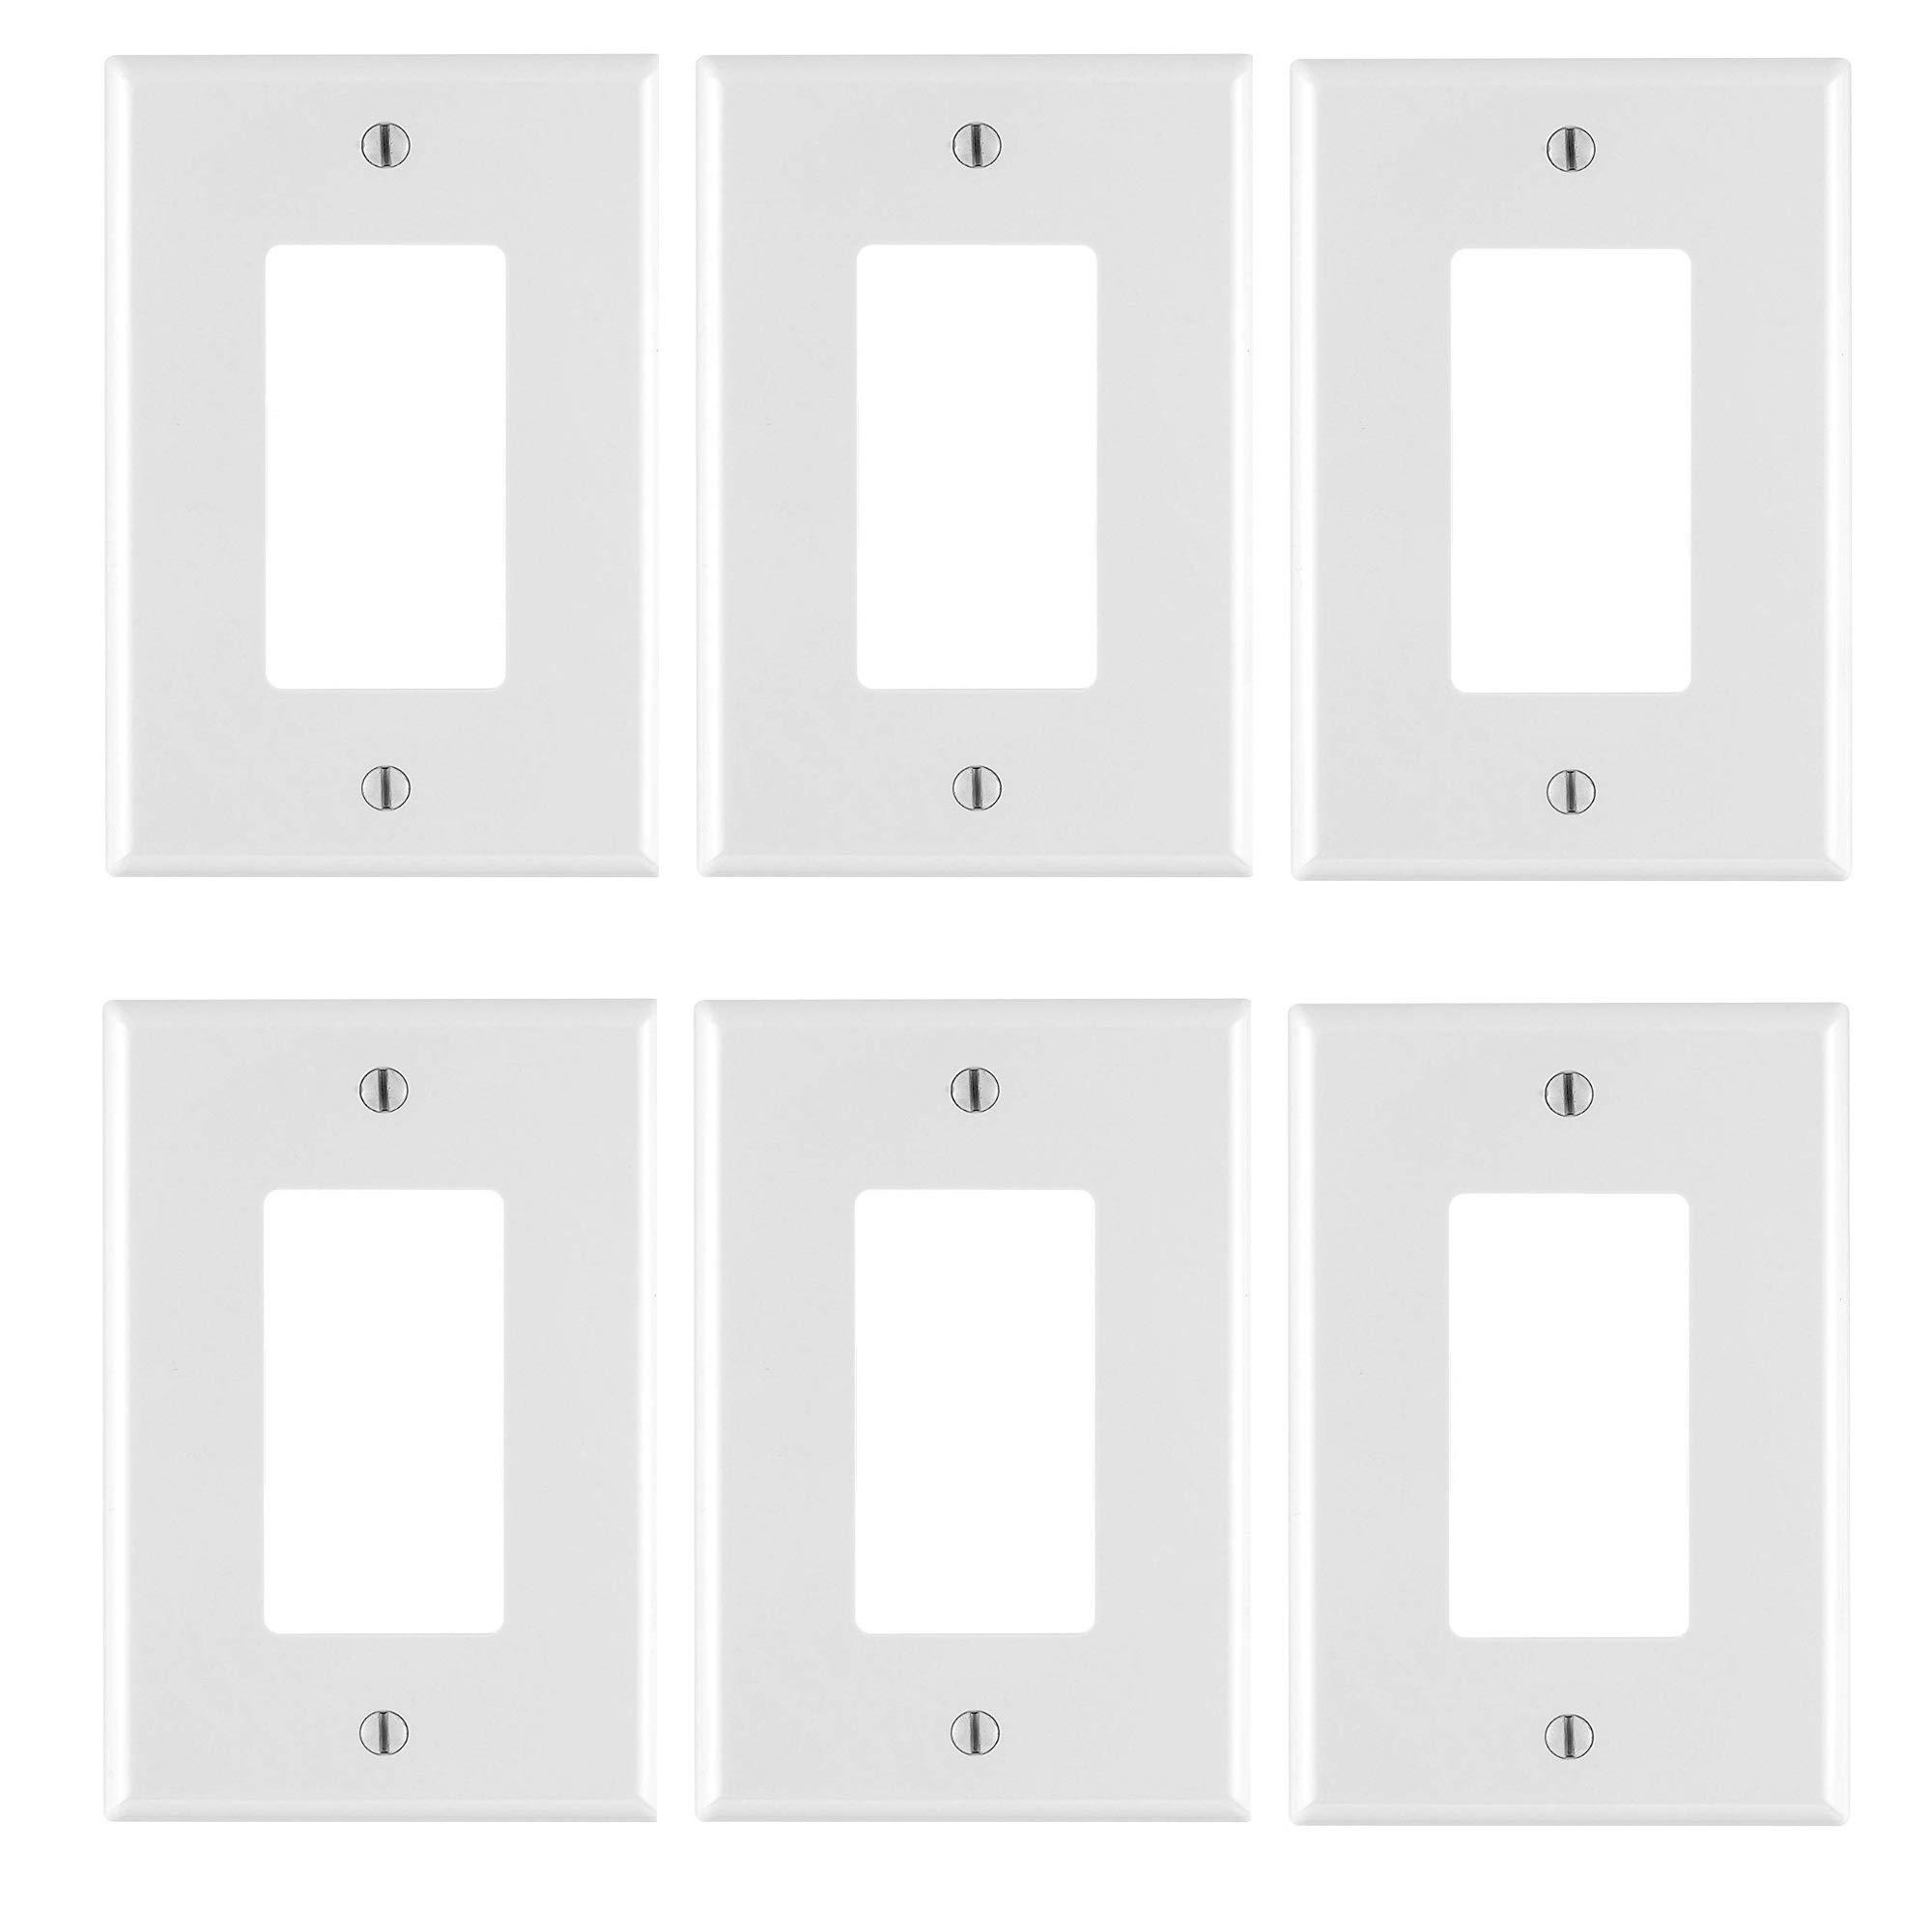 Leviton PJ26-WM 1-Gang Decora/GFCI Wallplate, White, 6 PACK